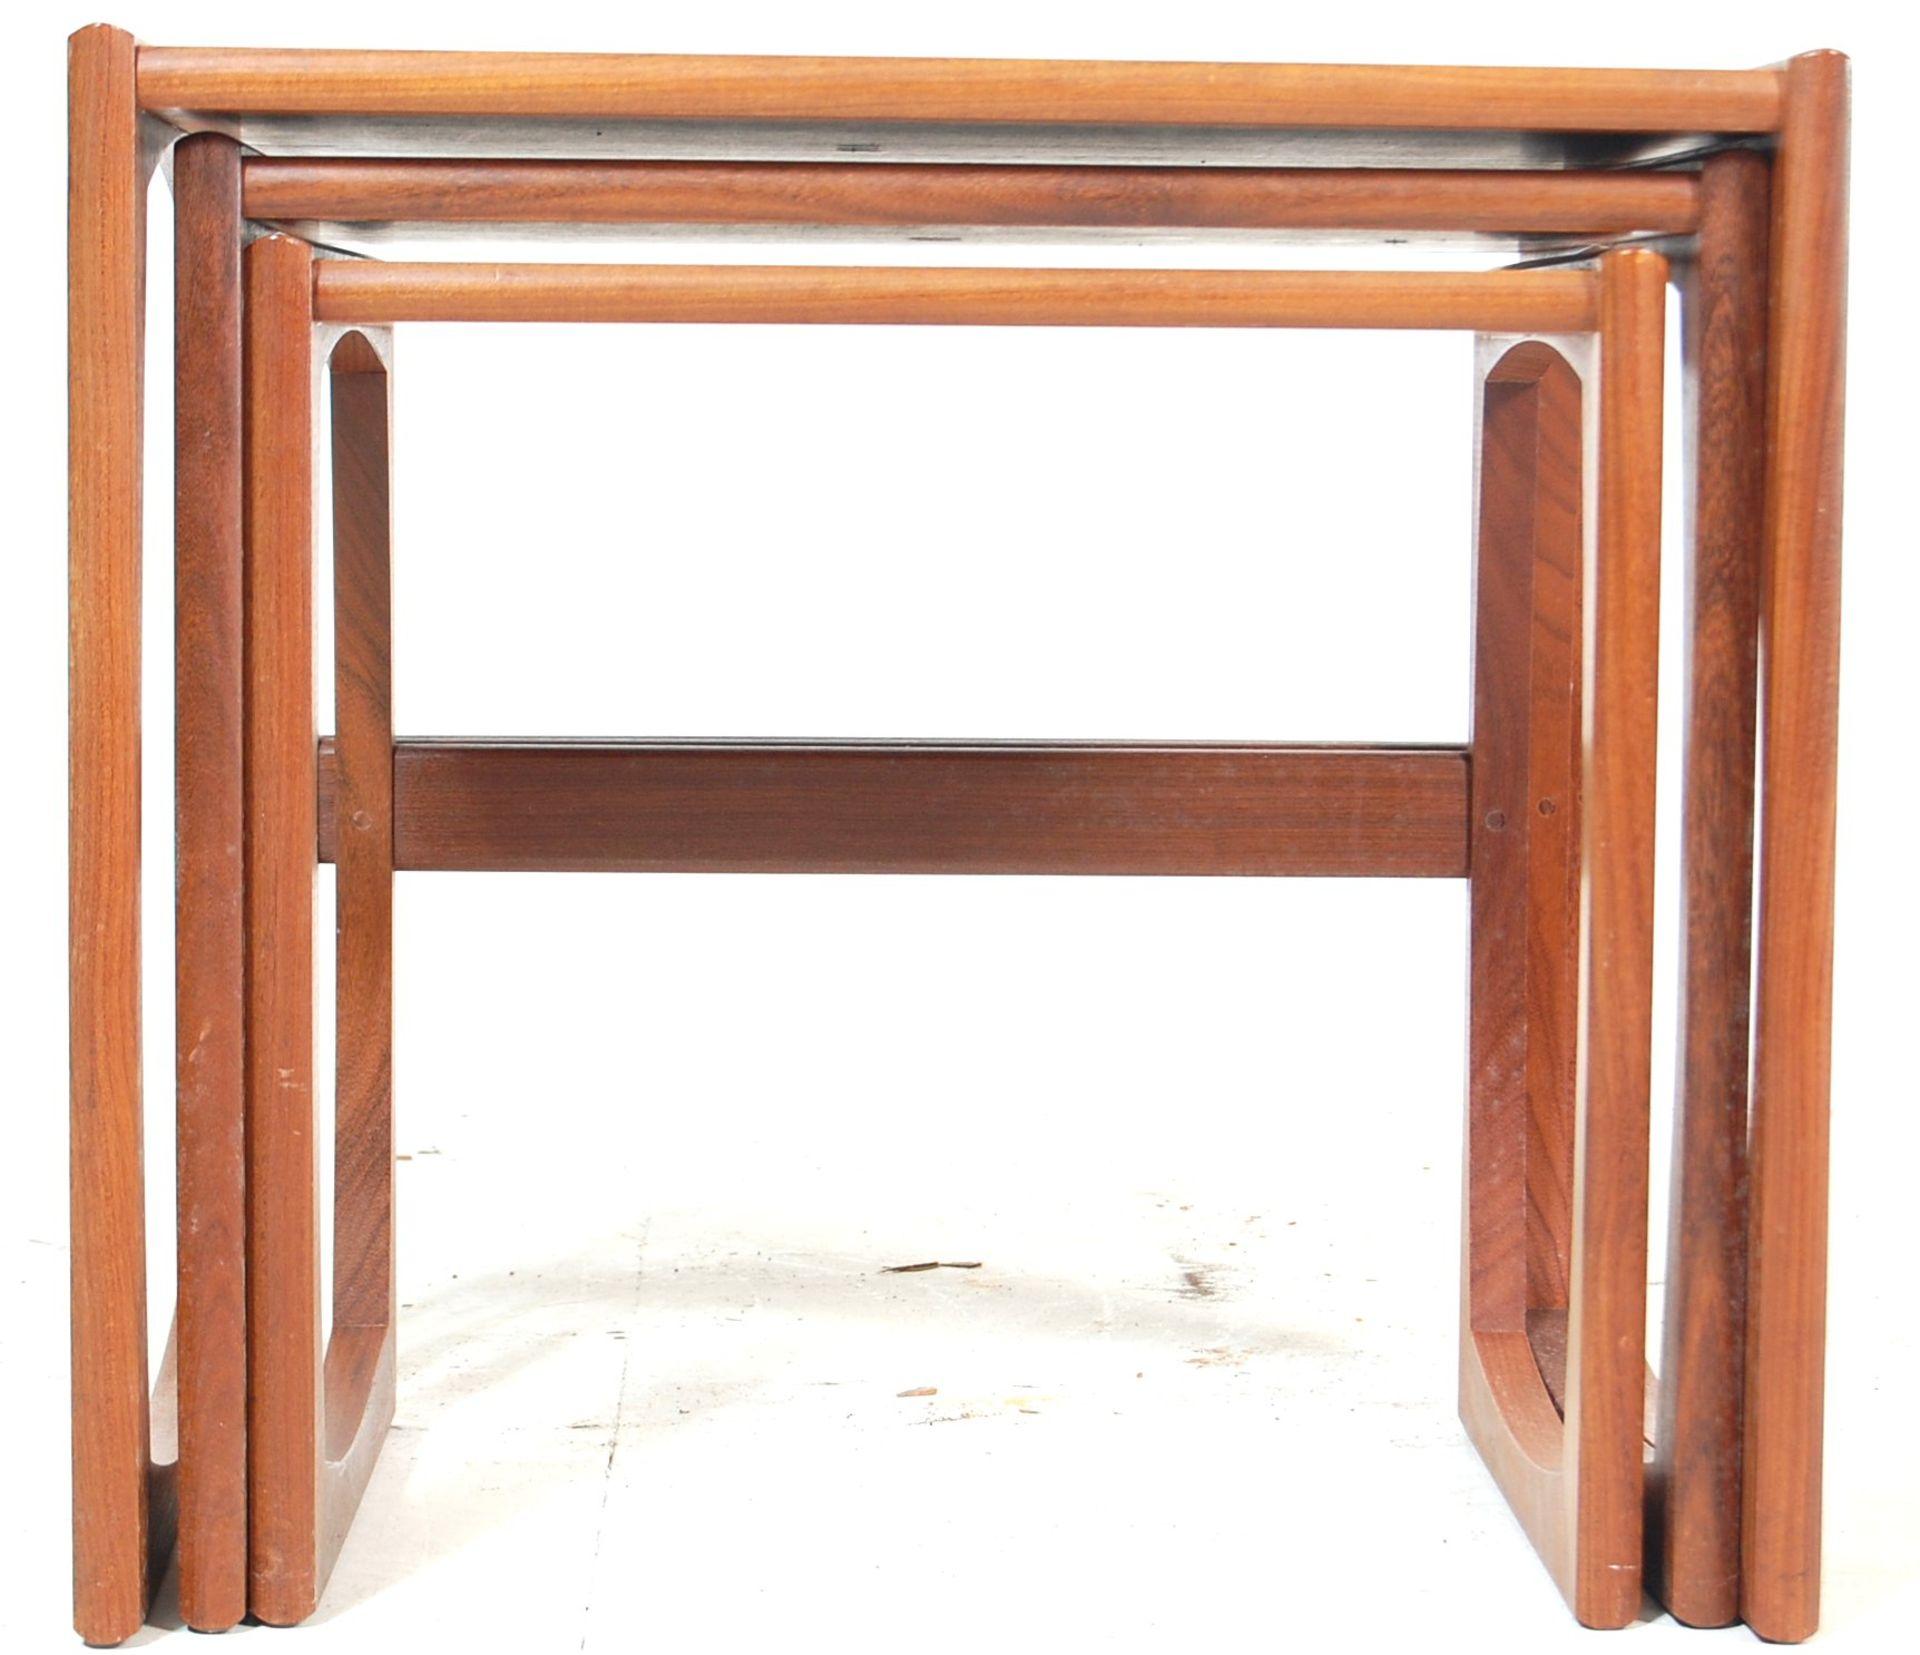 A RETRO 1960'S TEAK WOOD G PLAN FRESCO NEST OF TABLES - Image 2 of 4